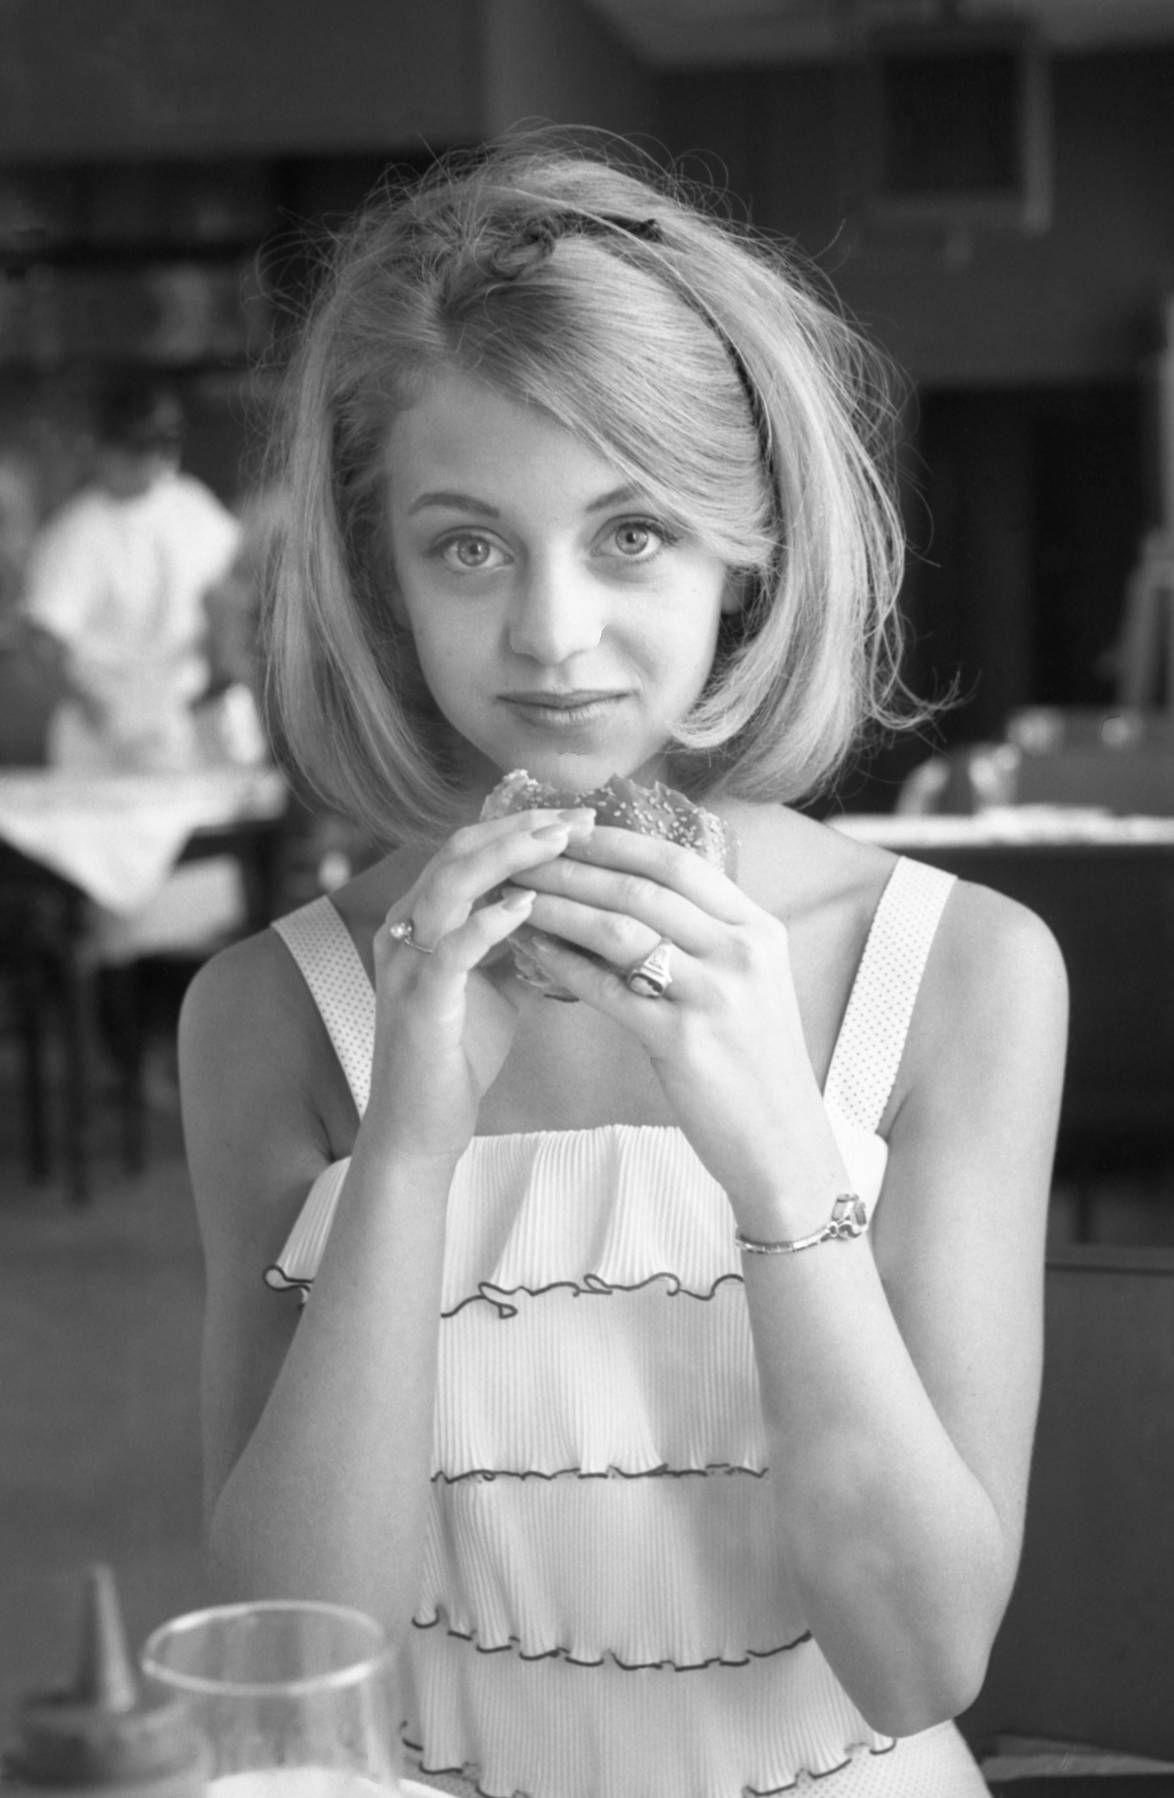 22 Famous Beauties Stuffing Their Faces | Голди хоун, Знаменитости ...